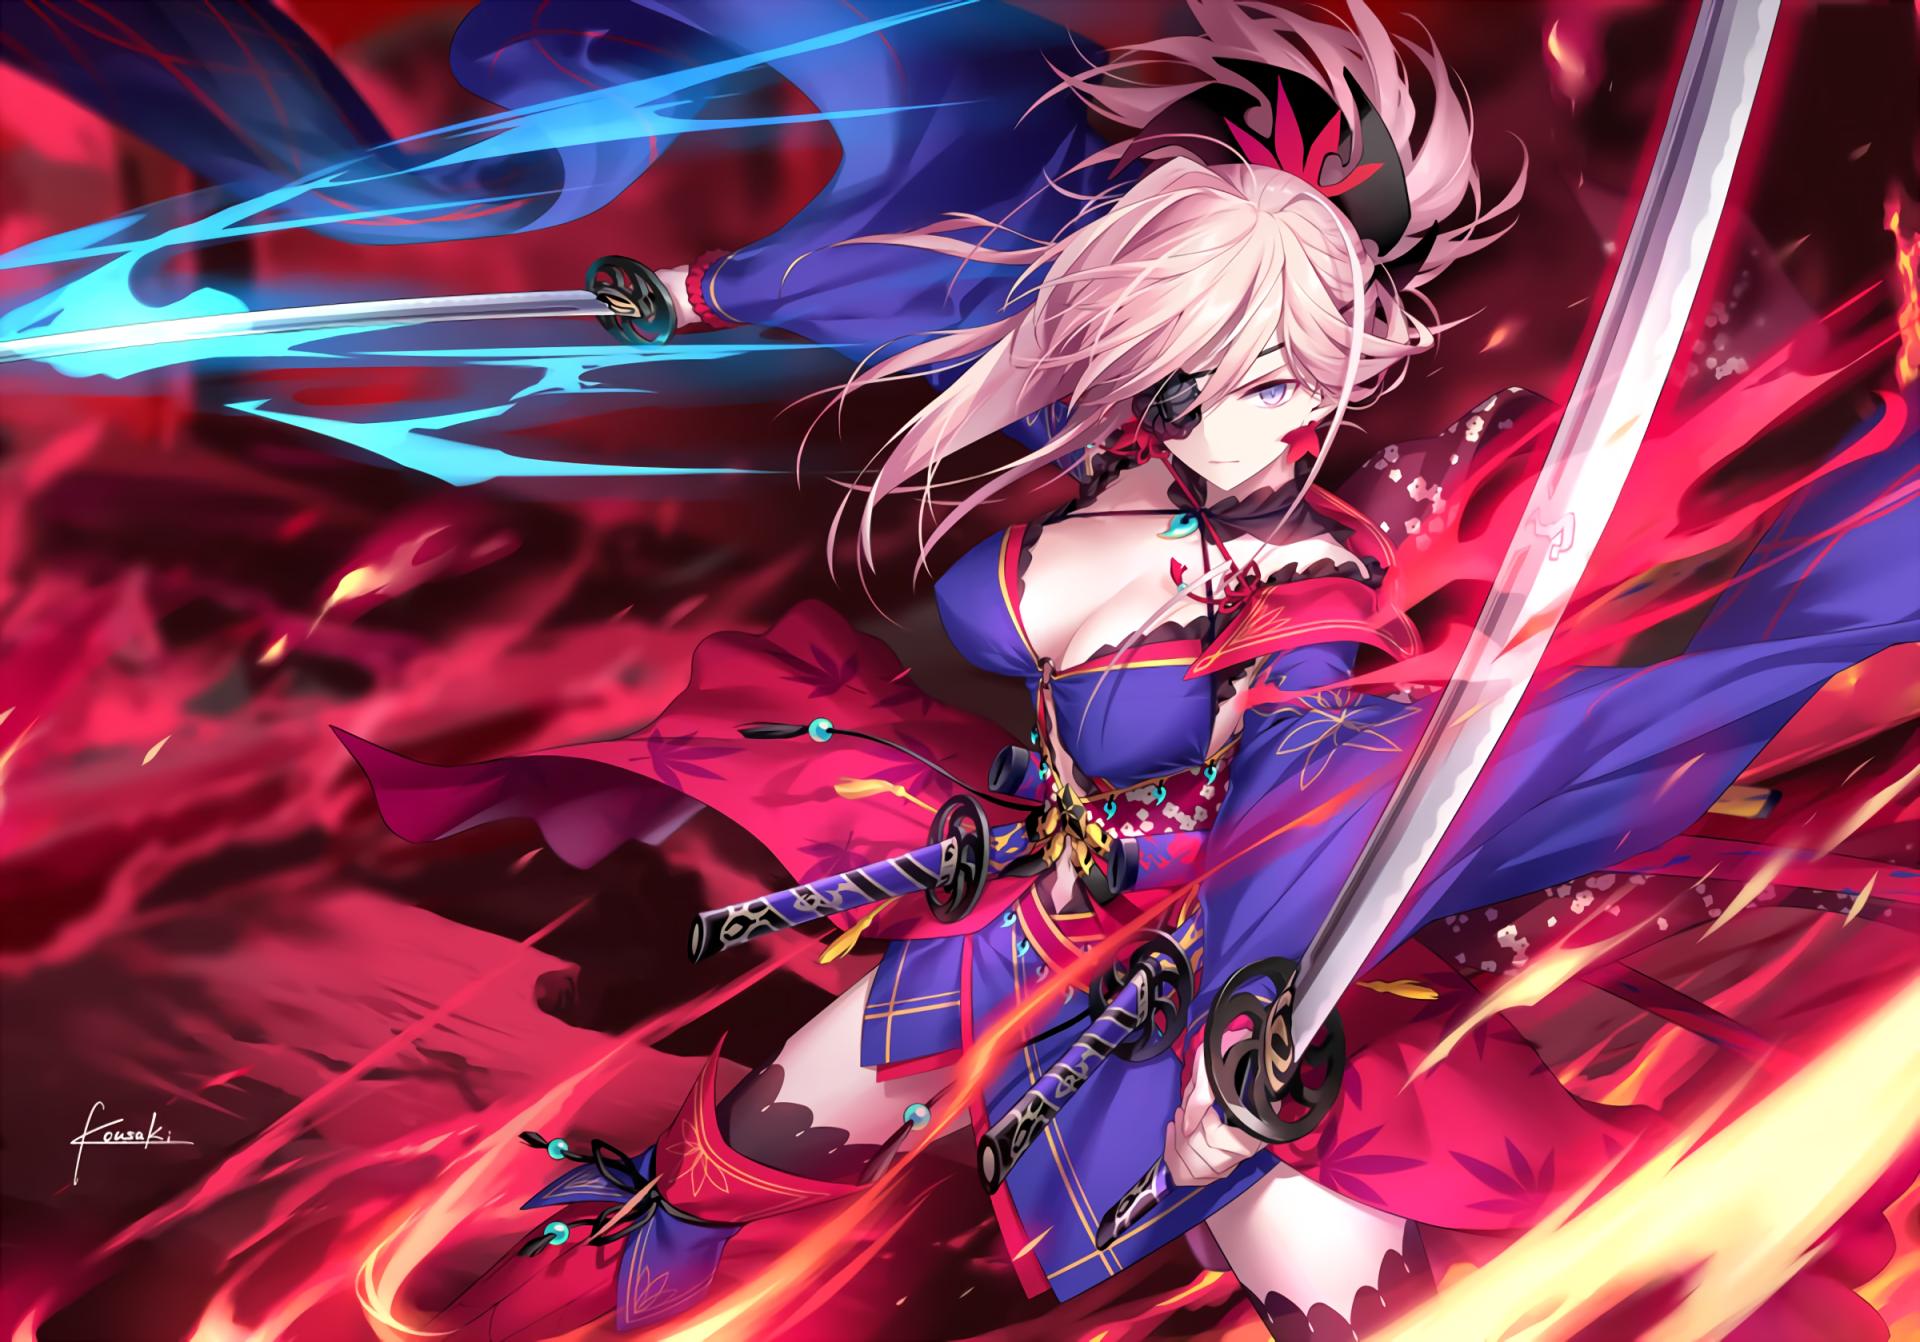 Anime Fate Grand Order Miyamoto Musashi Wallpaper Anime Warrior Fate Anime Series Anime Warrior Girl